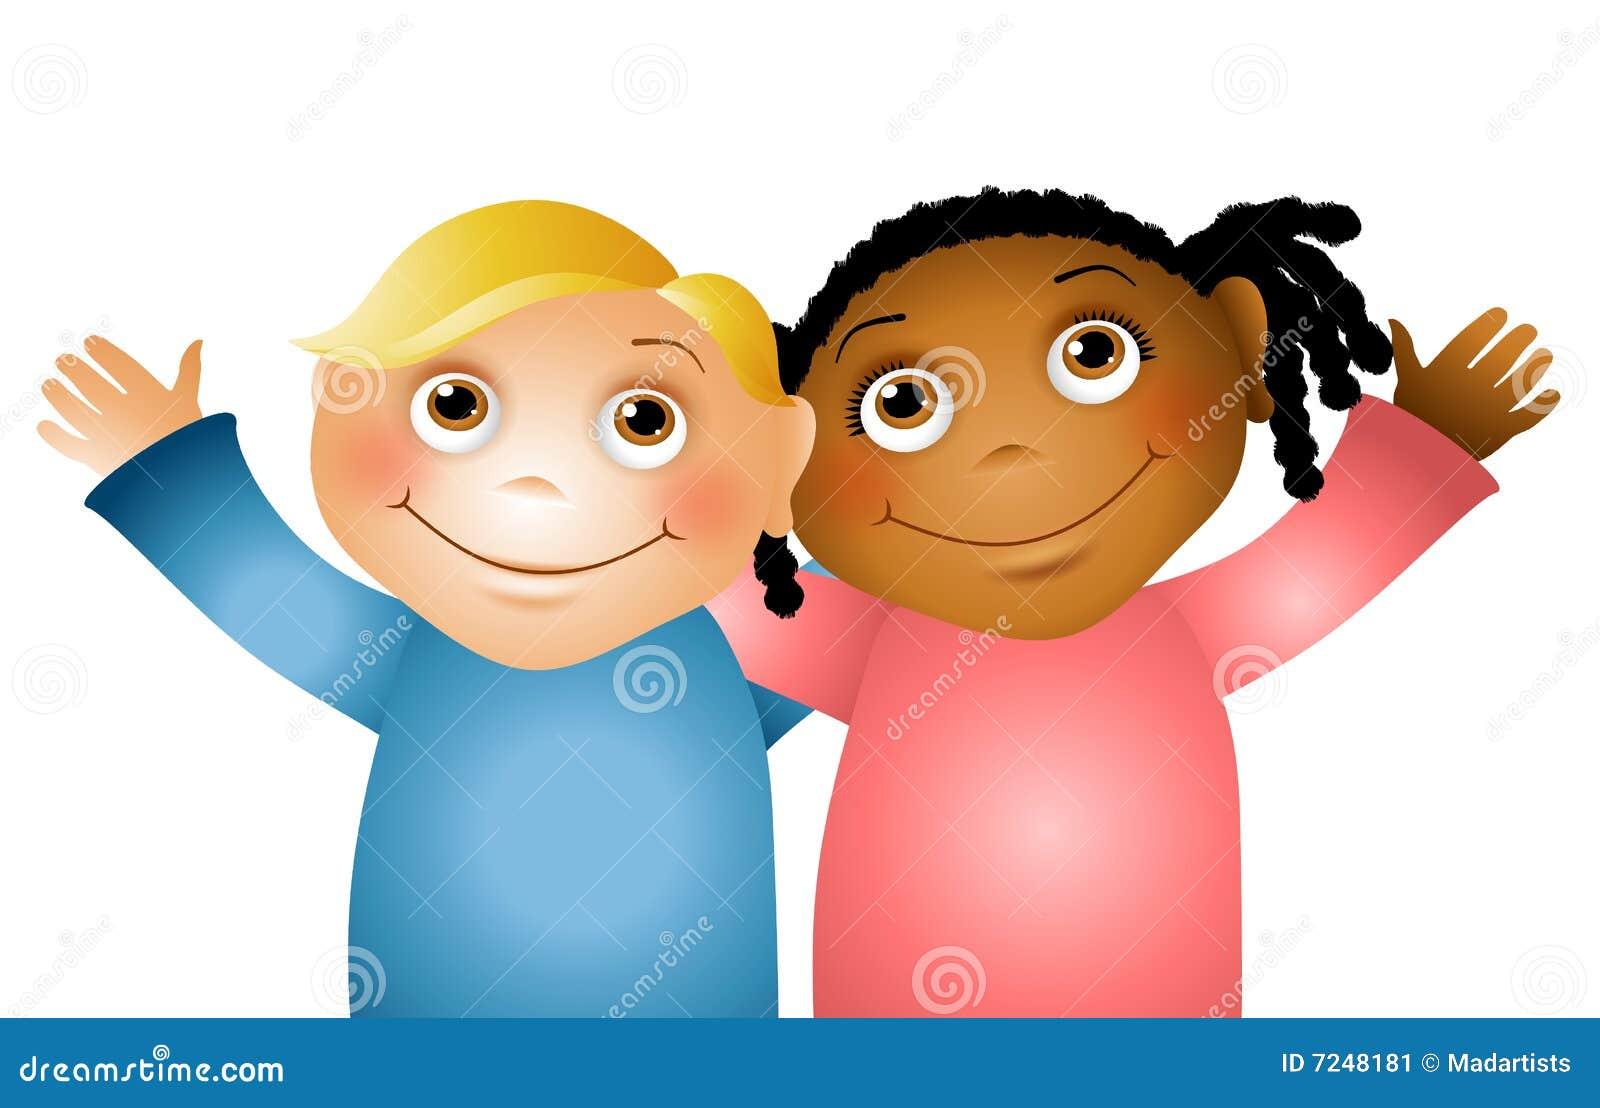 hugging children friends 2 stock illustration image of